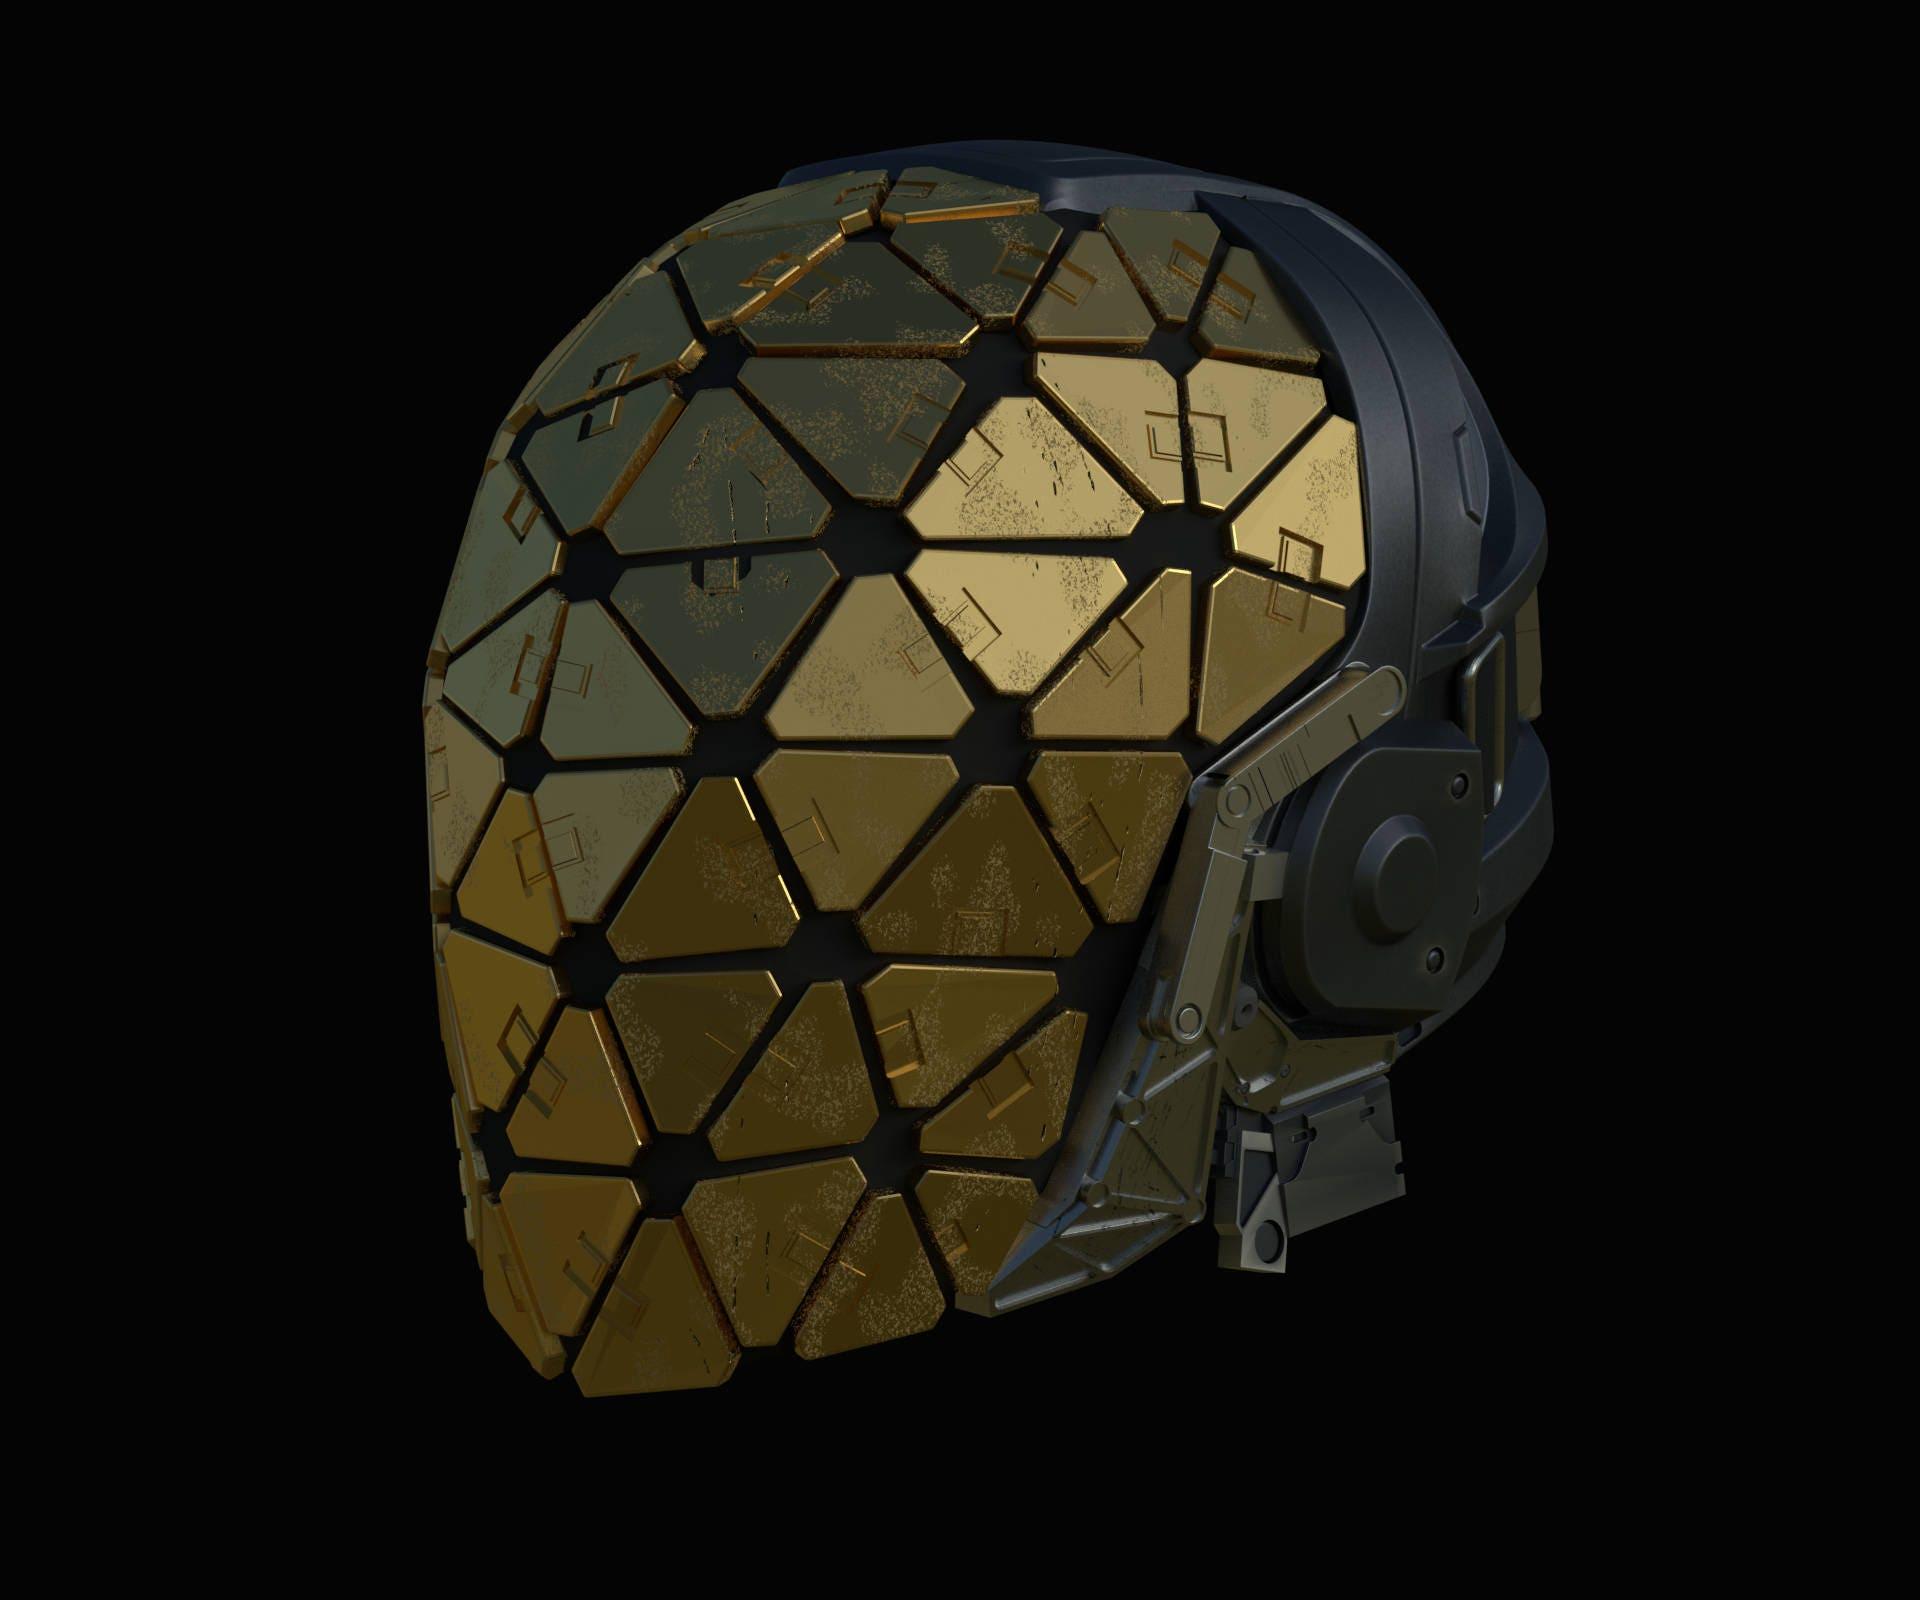 c9b58eb4c77 3D Model of Helmet from Deus Ex Mankind Divided for